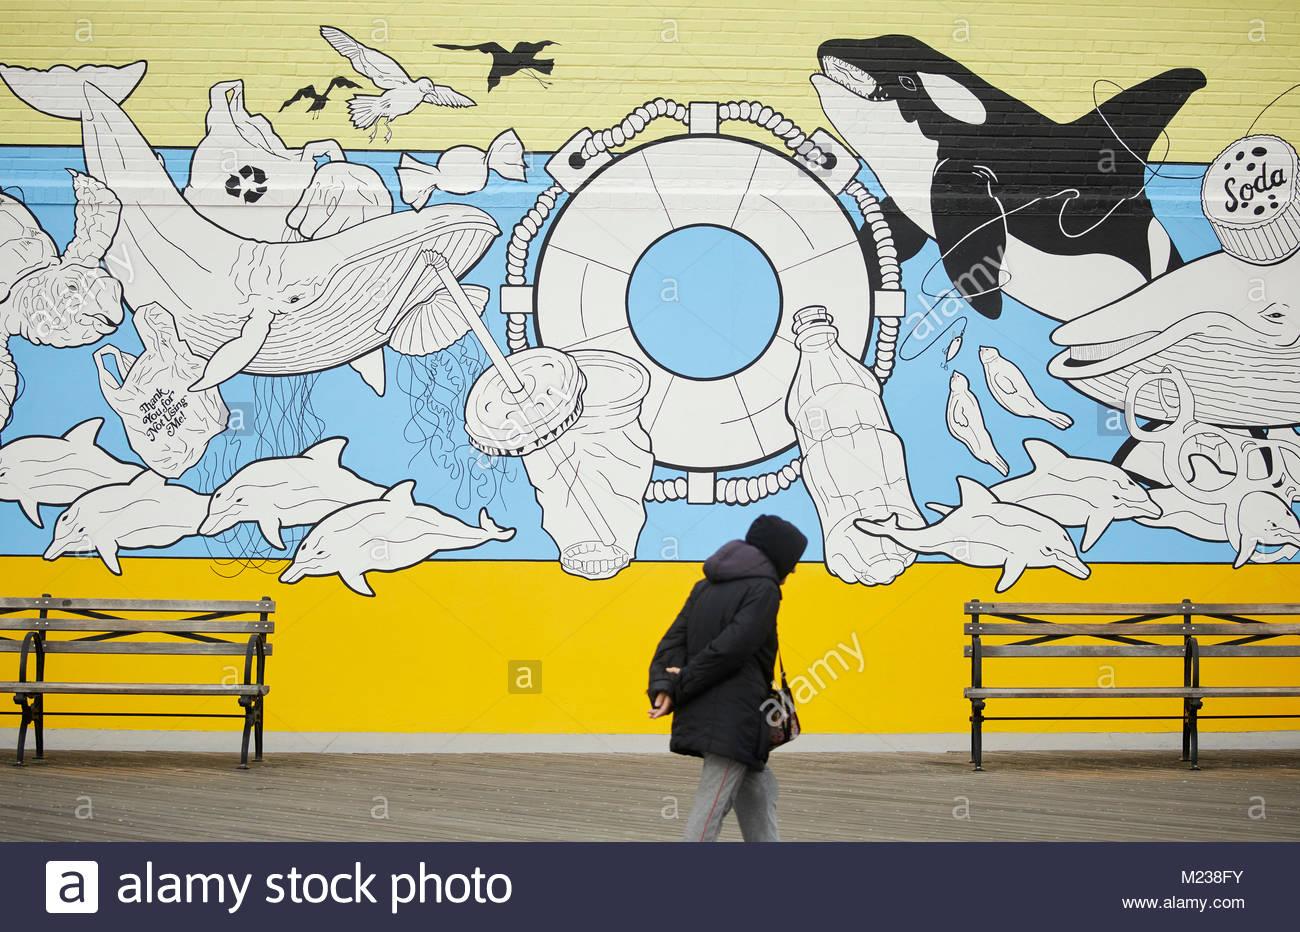 Street Art Graffiti New York Stock Photos & Street Art Graffiti New ...